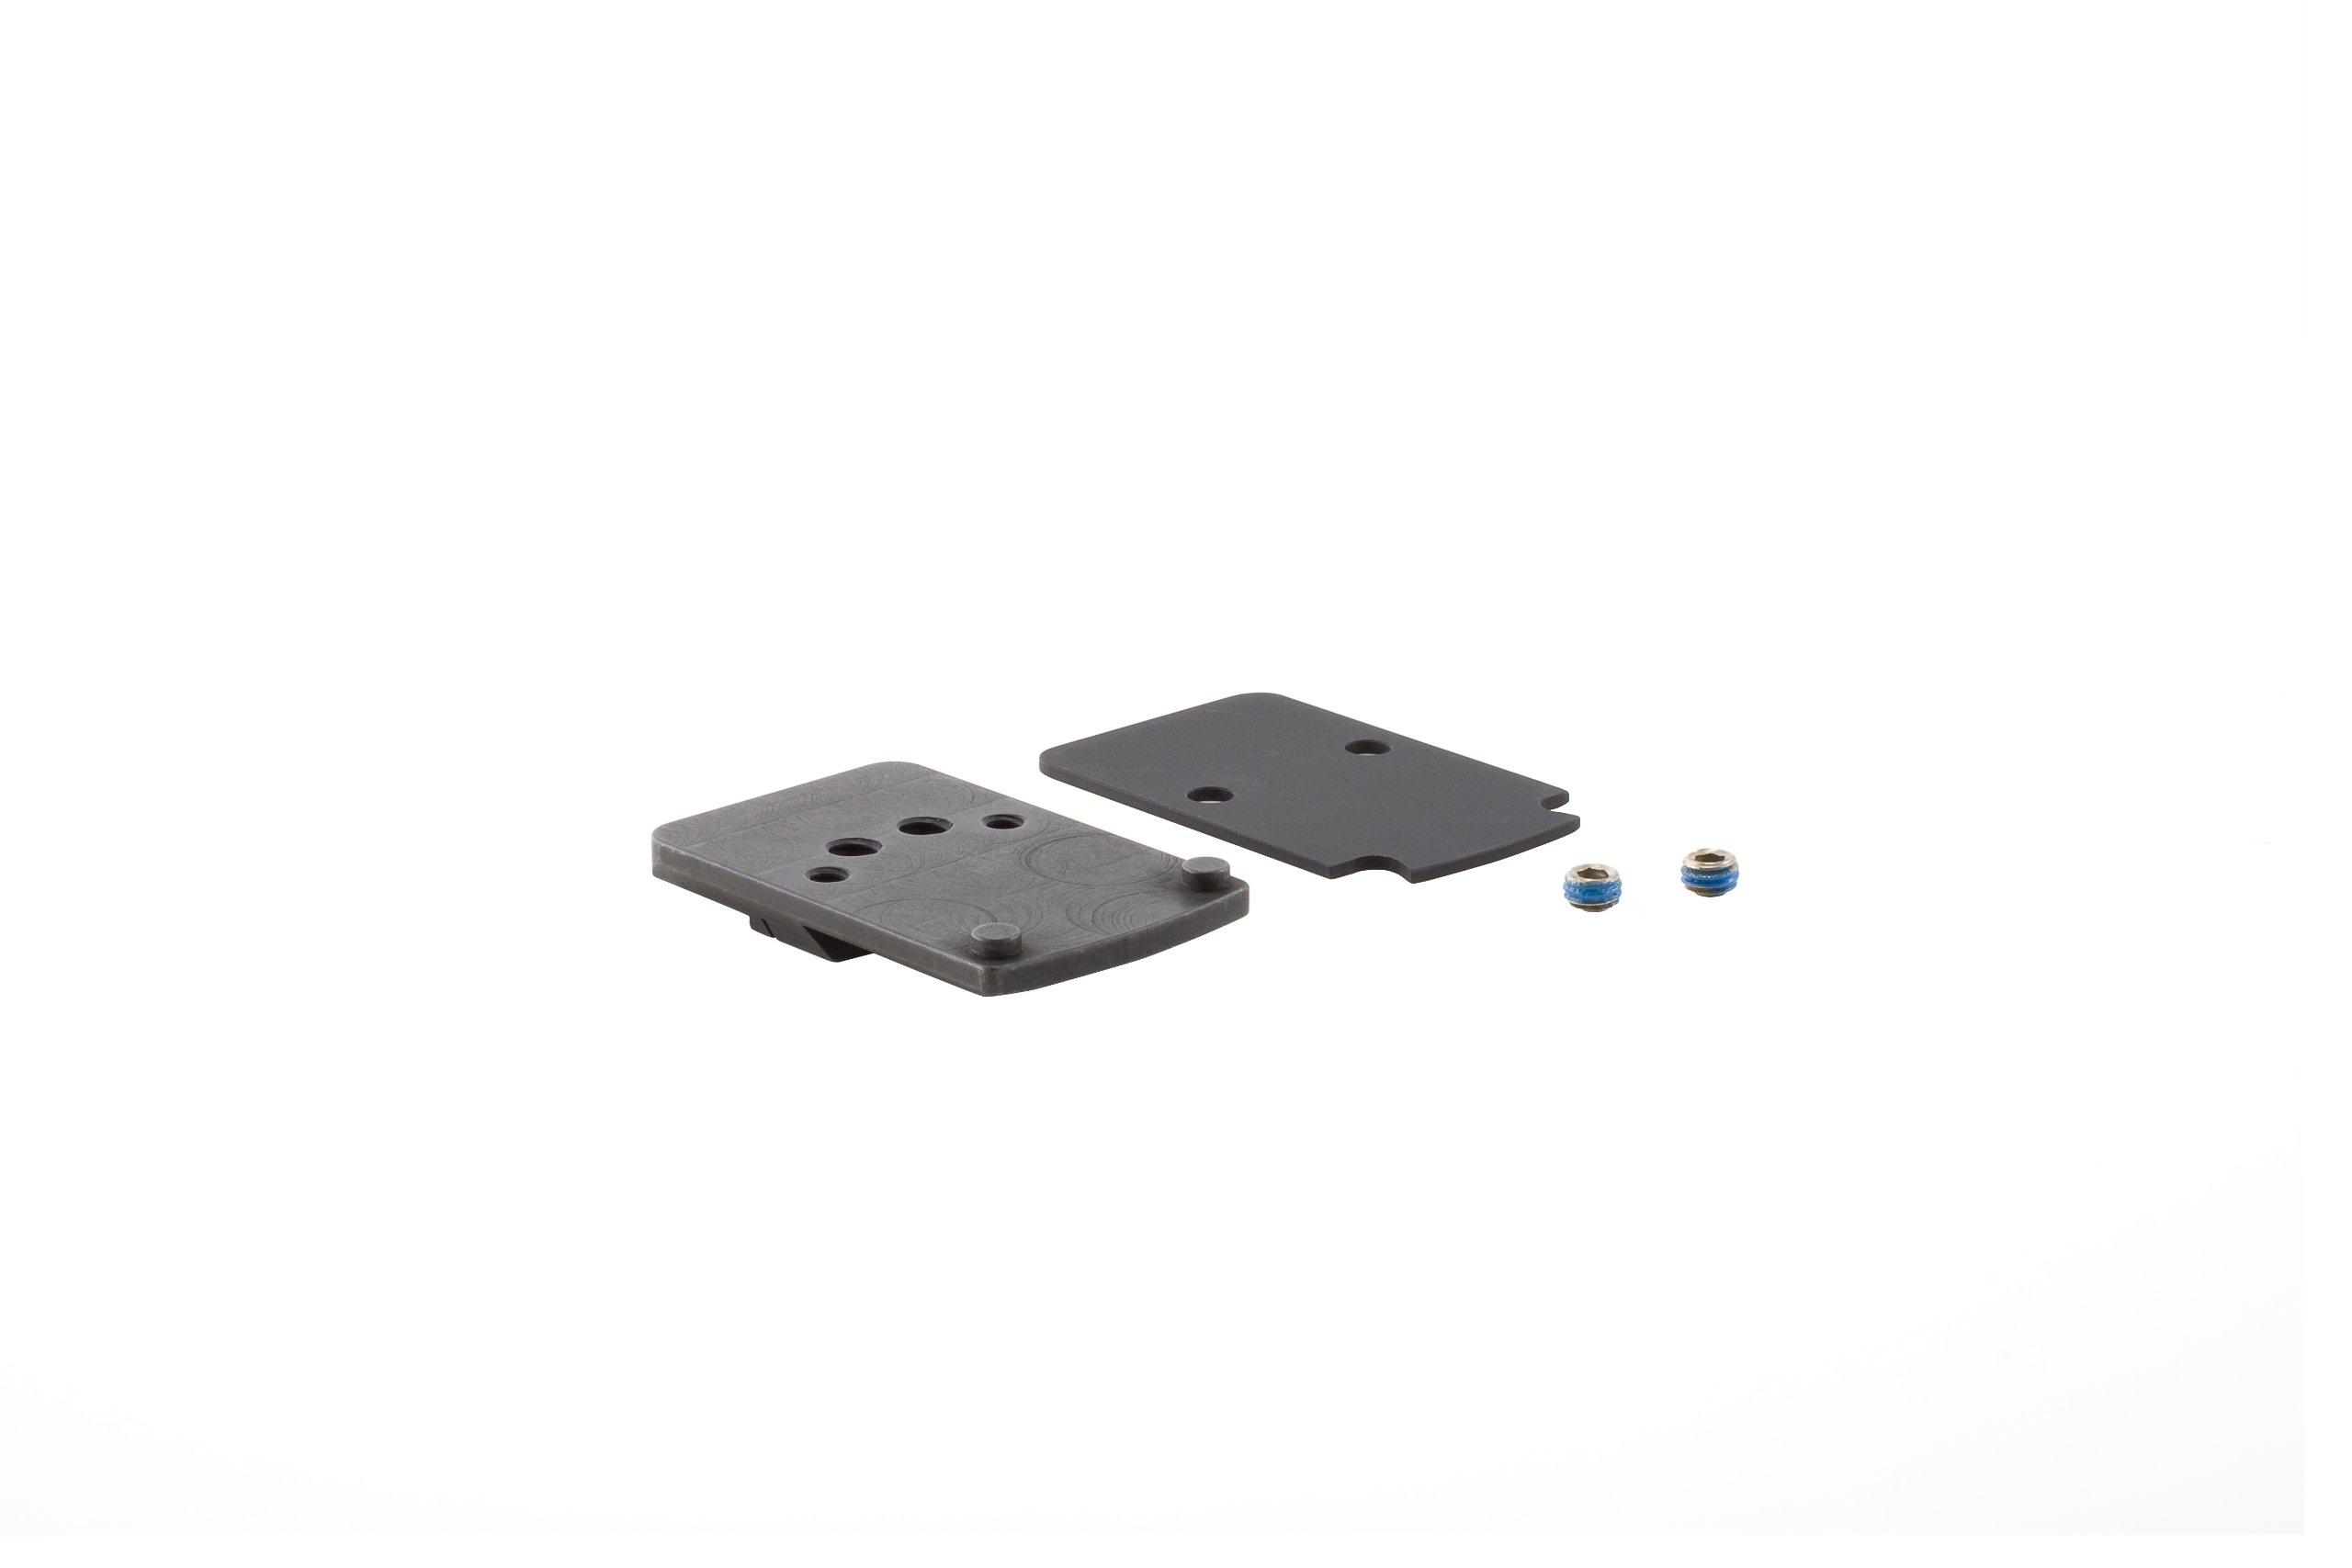 Trijicon RM45 RMR Pistol Mount, S&W M&P/SD9 Ve/SD40 Ve/ Models (Excluding M&P Shield & Core Series), black